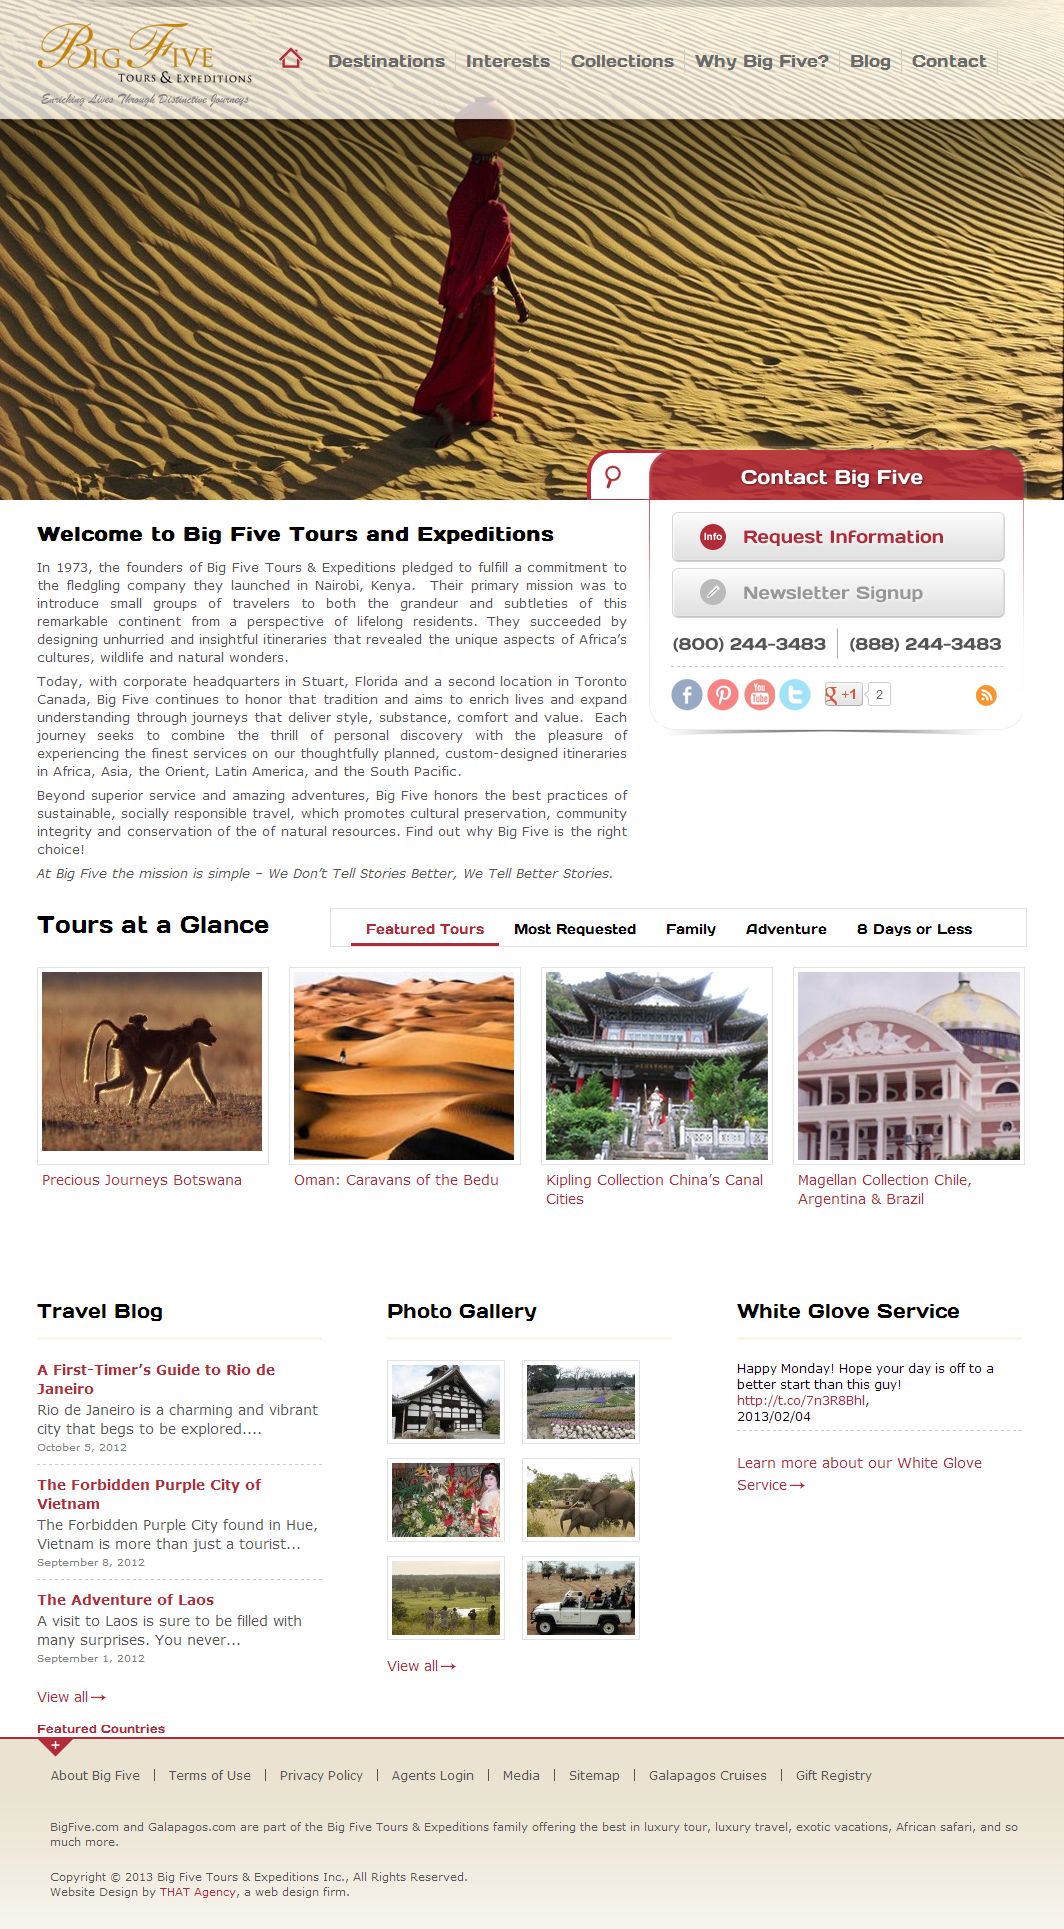 Big Five Tours Expeditions Web Design Company Web Design Web Design Projects